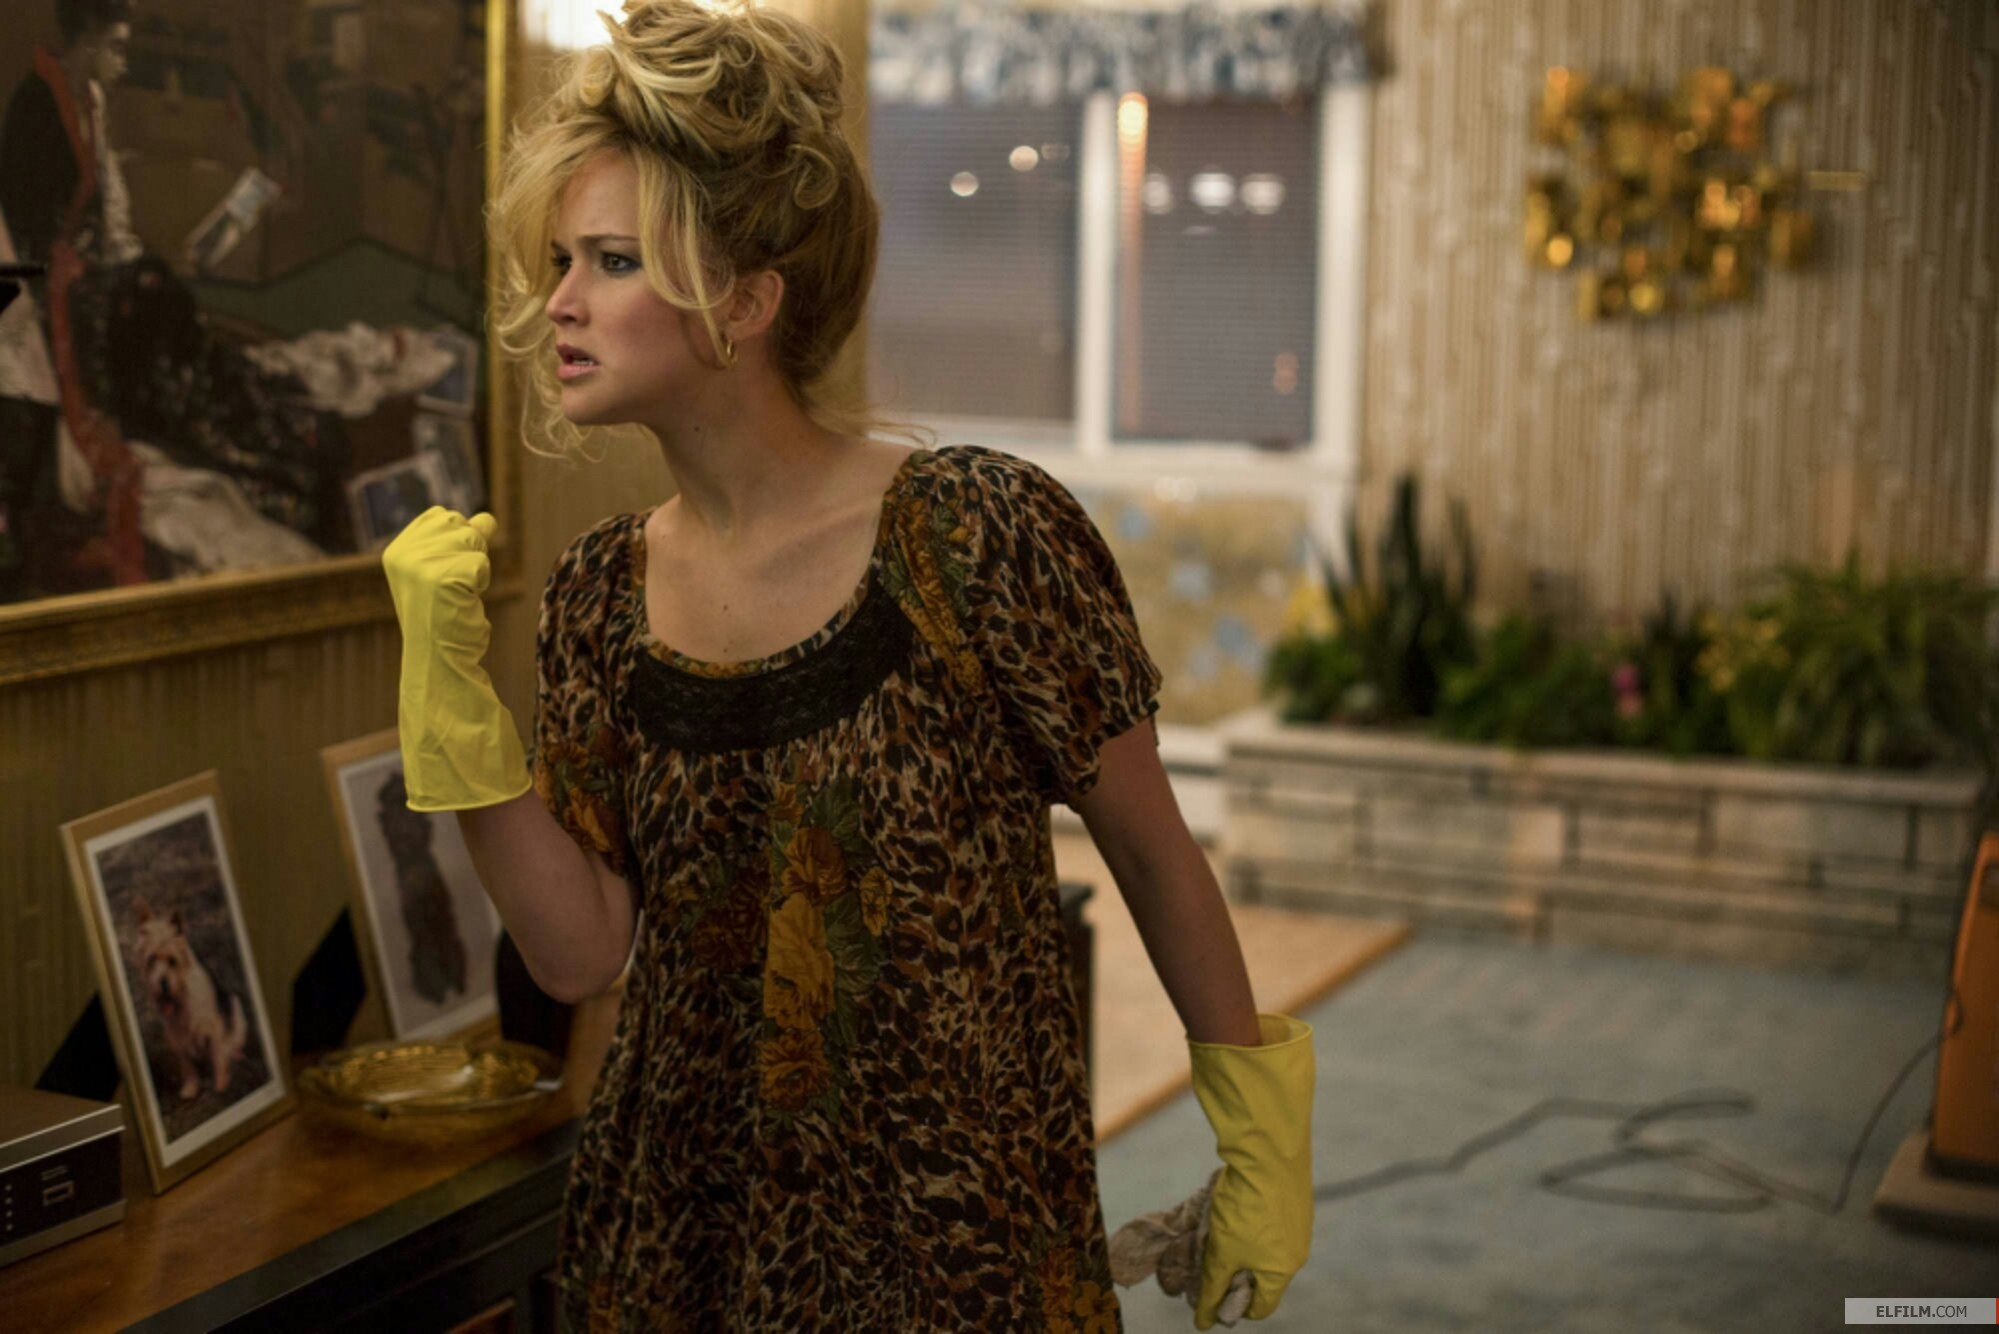 Jennifer Lawrence em seu momento 'Live and Let Die' (photo by elfilm.com)